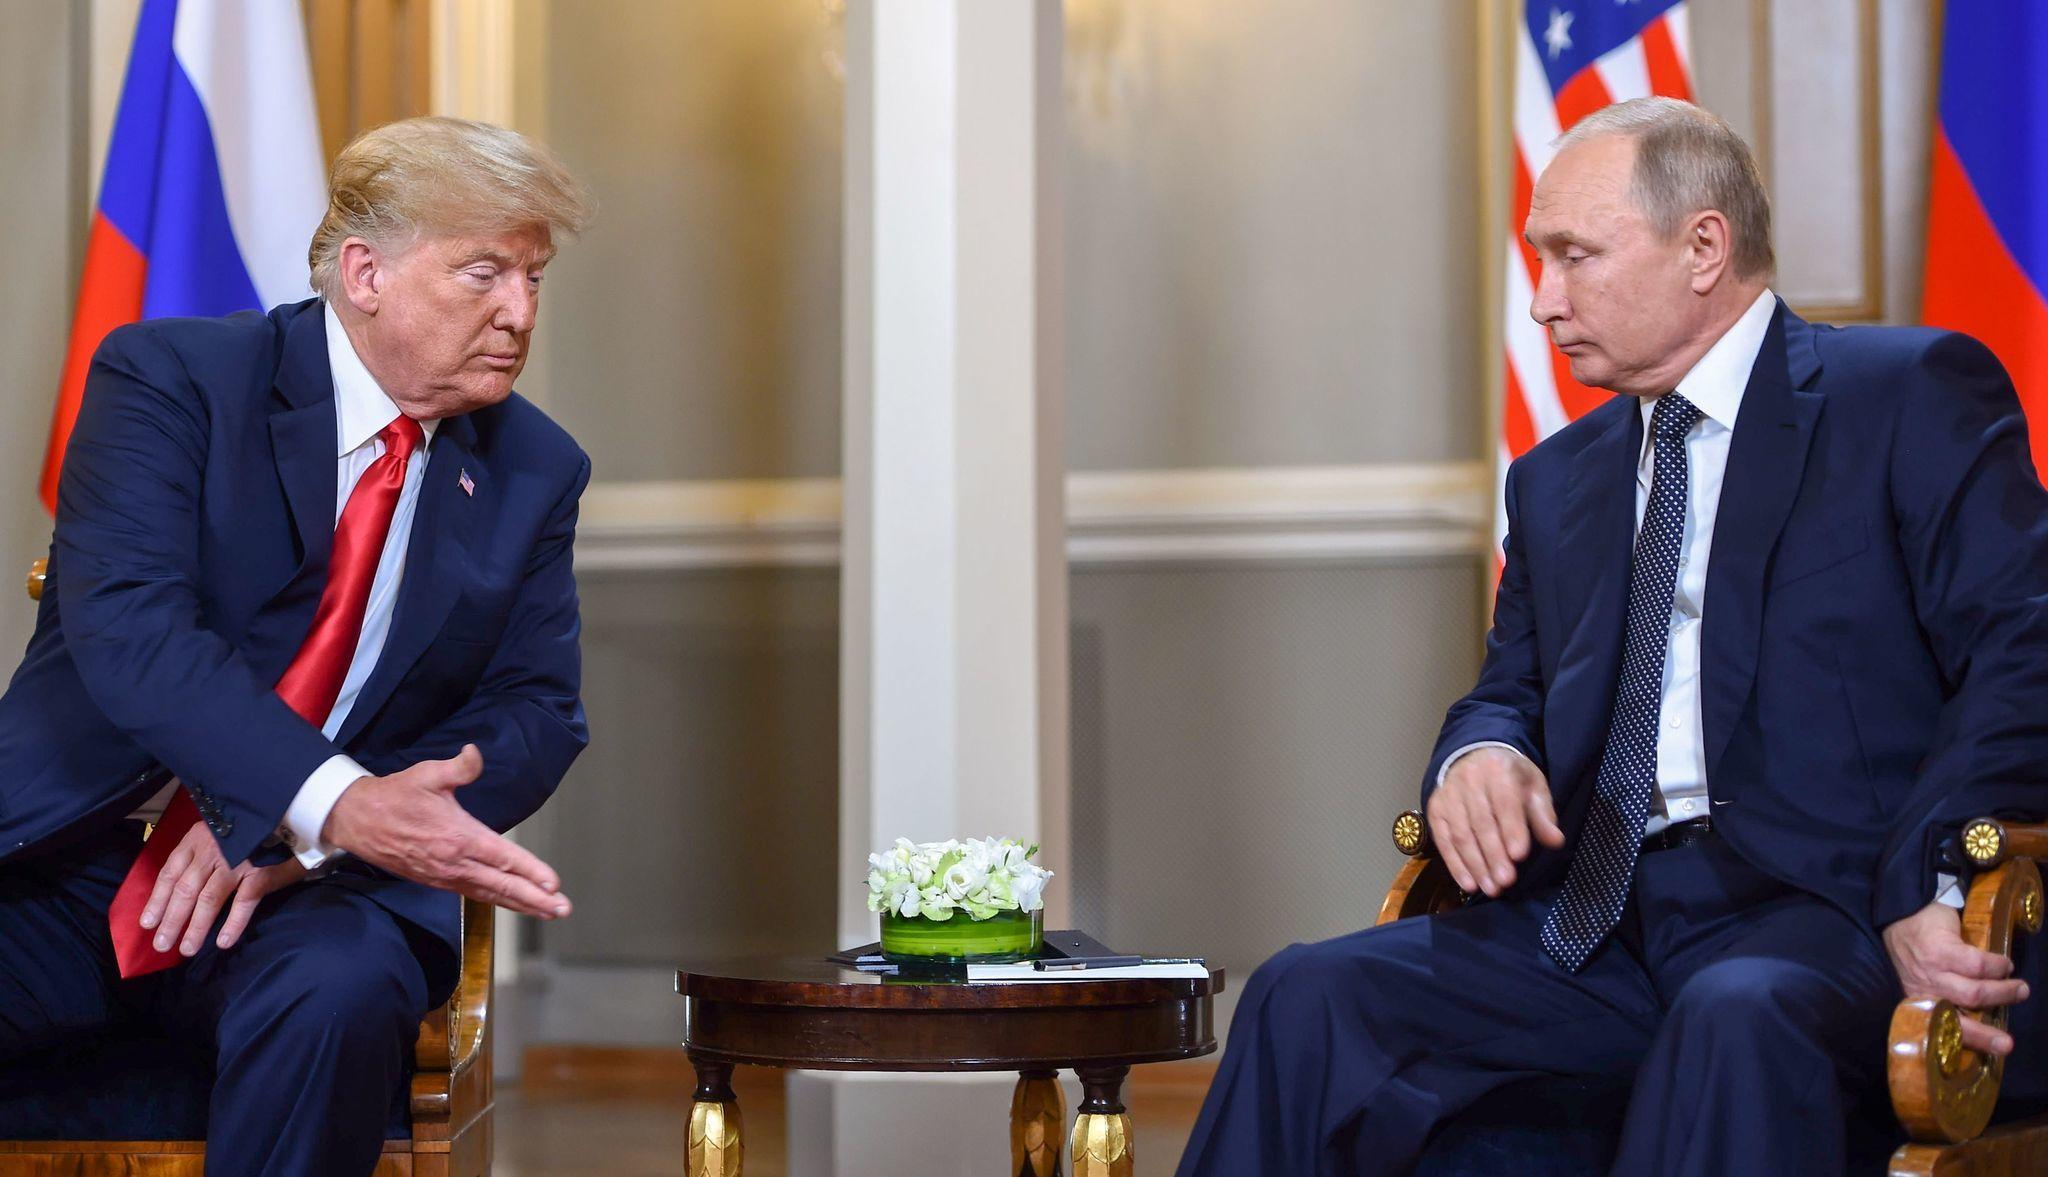 Perhaps Trump should read 'The Art of the Deal'